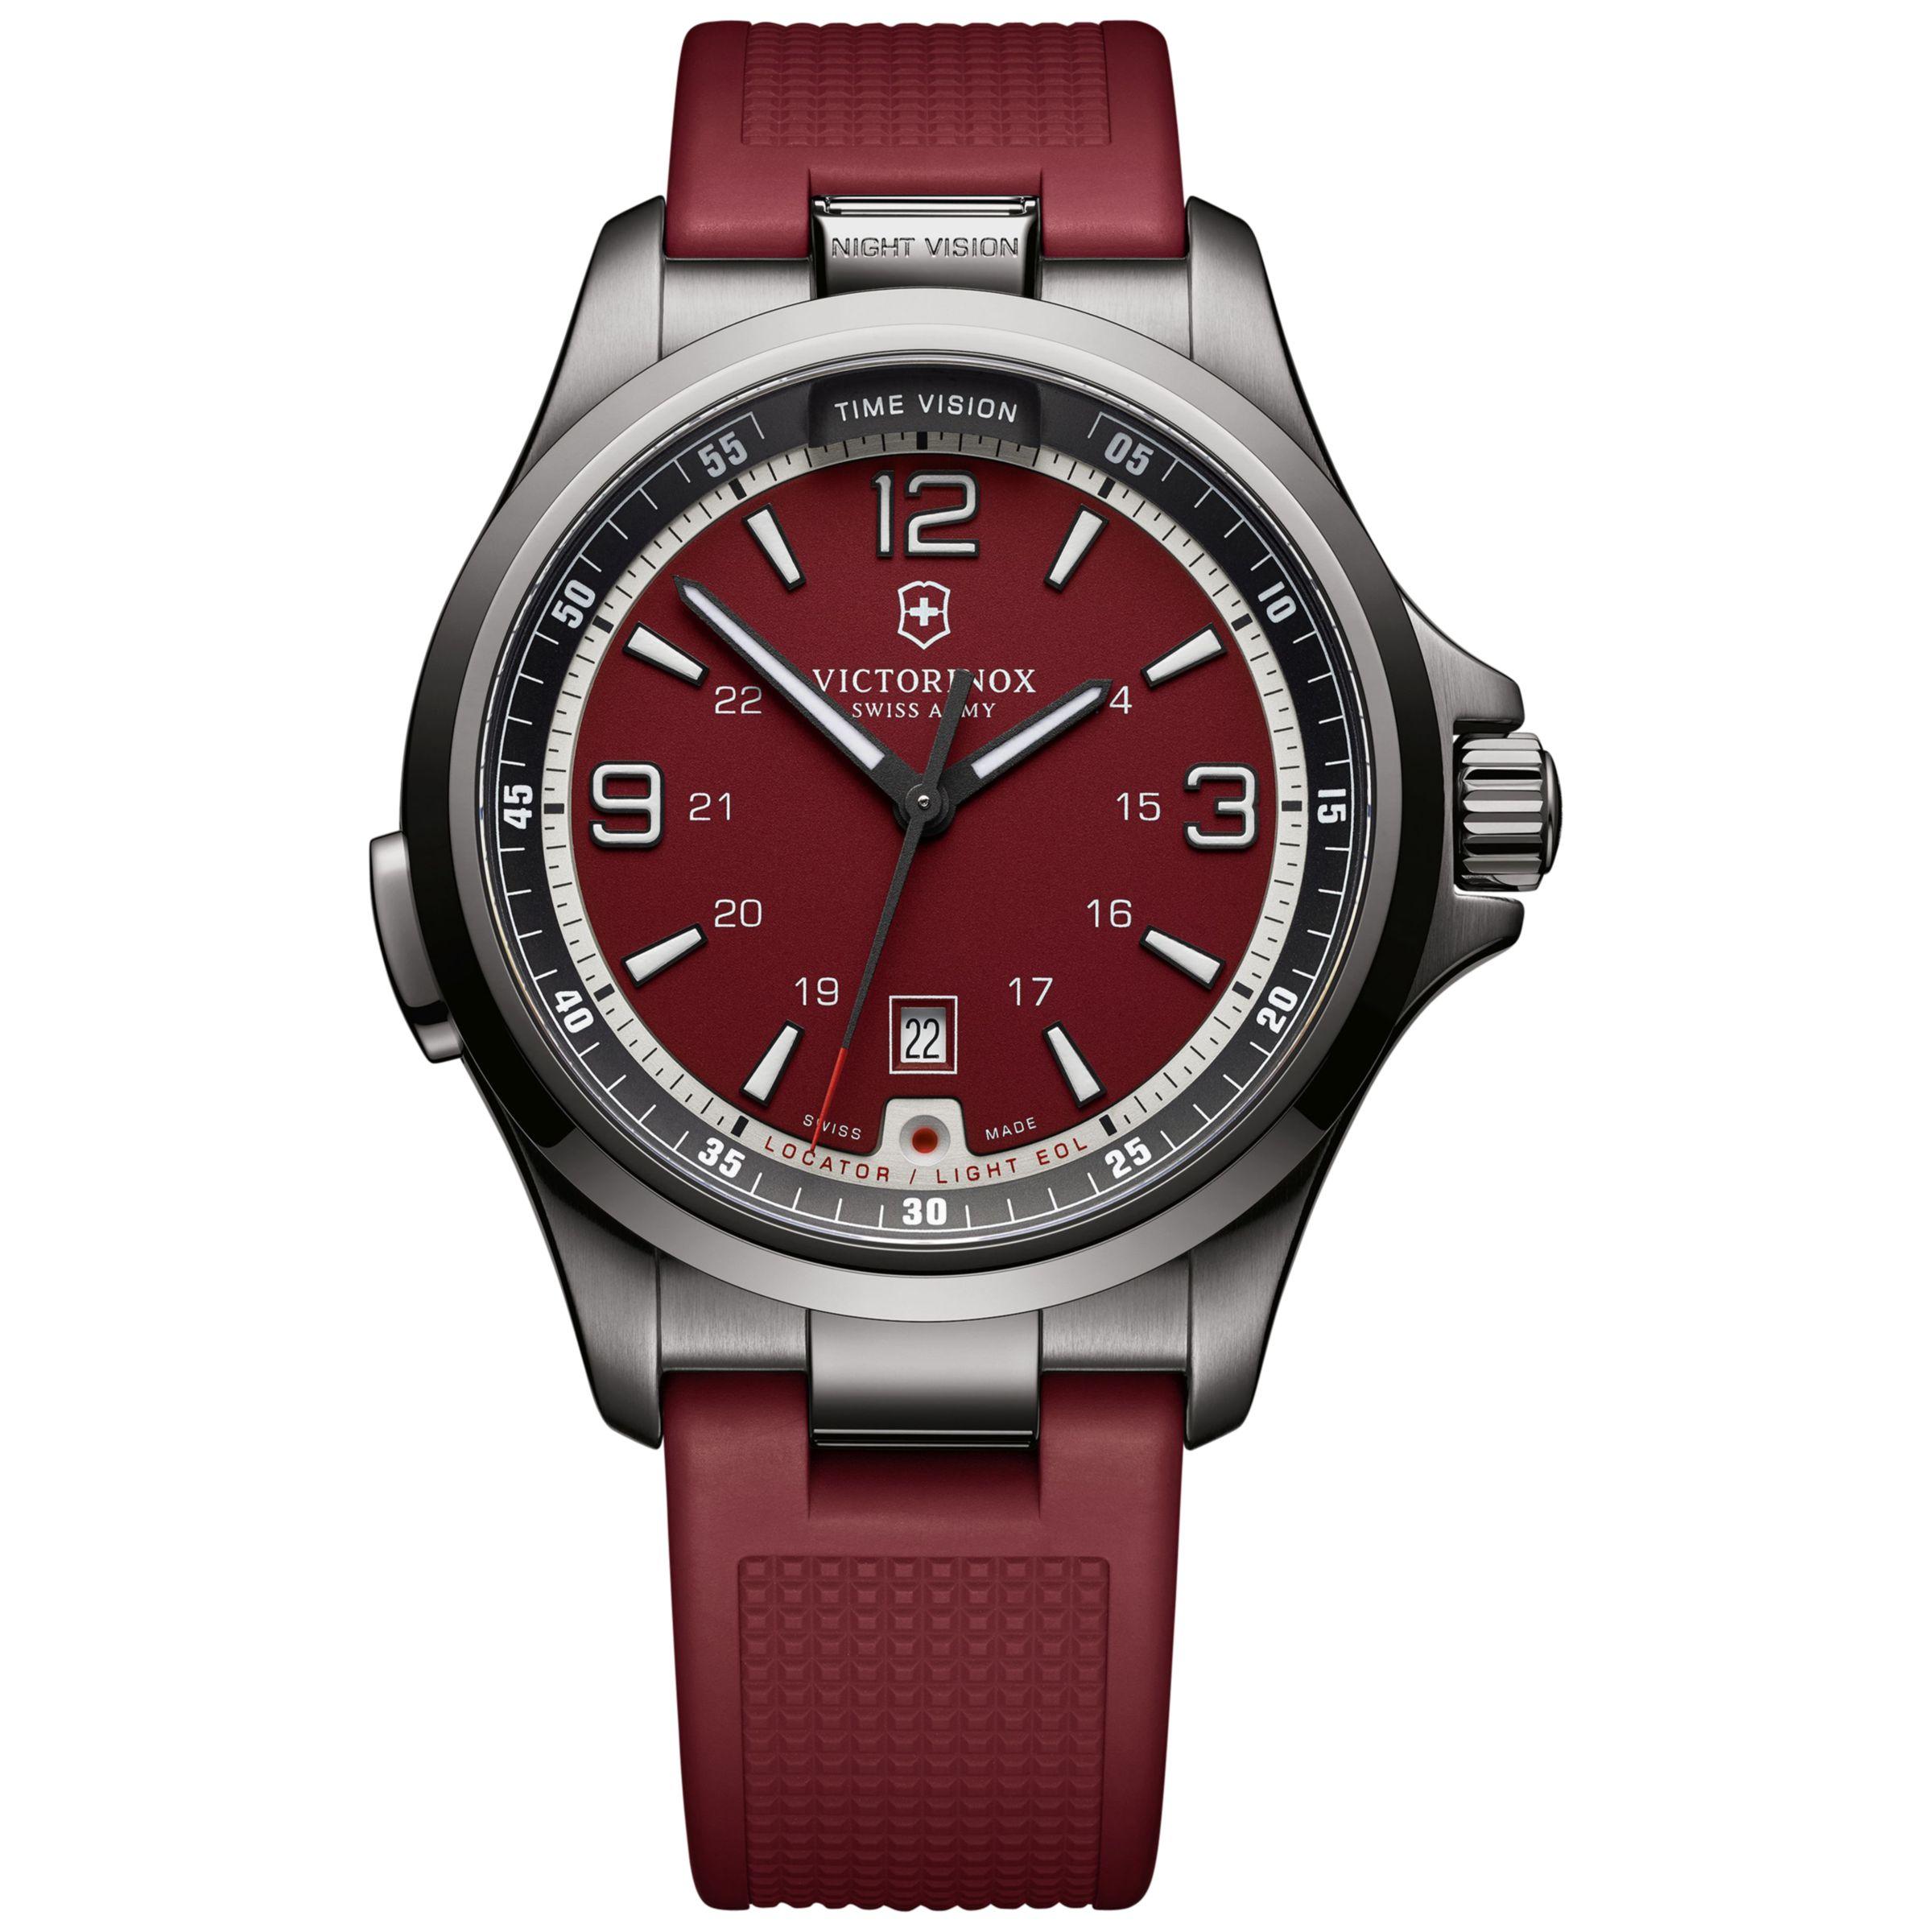 Victorinox Victorinox 241717 Men's Night Vision Rubber Strap Watch, Red